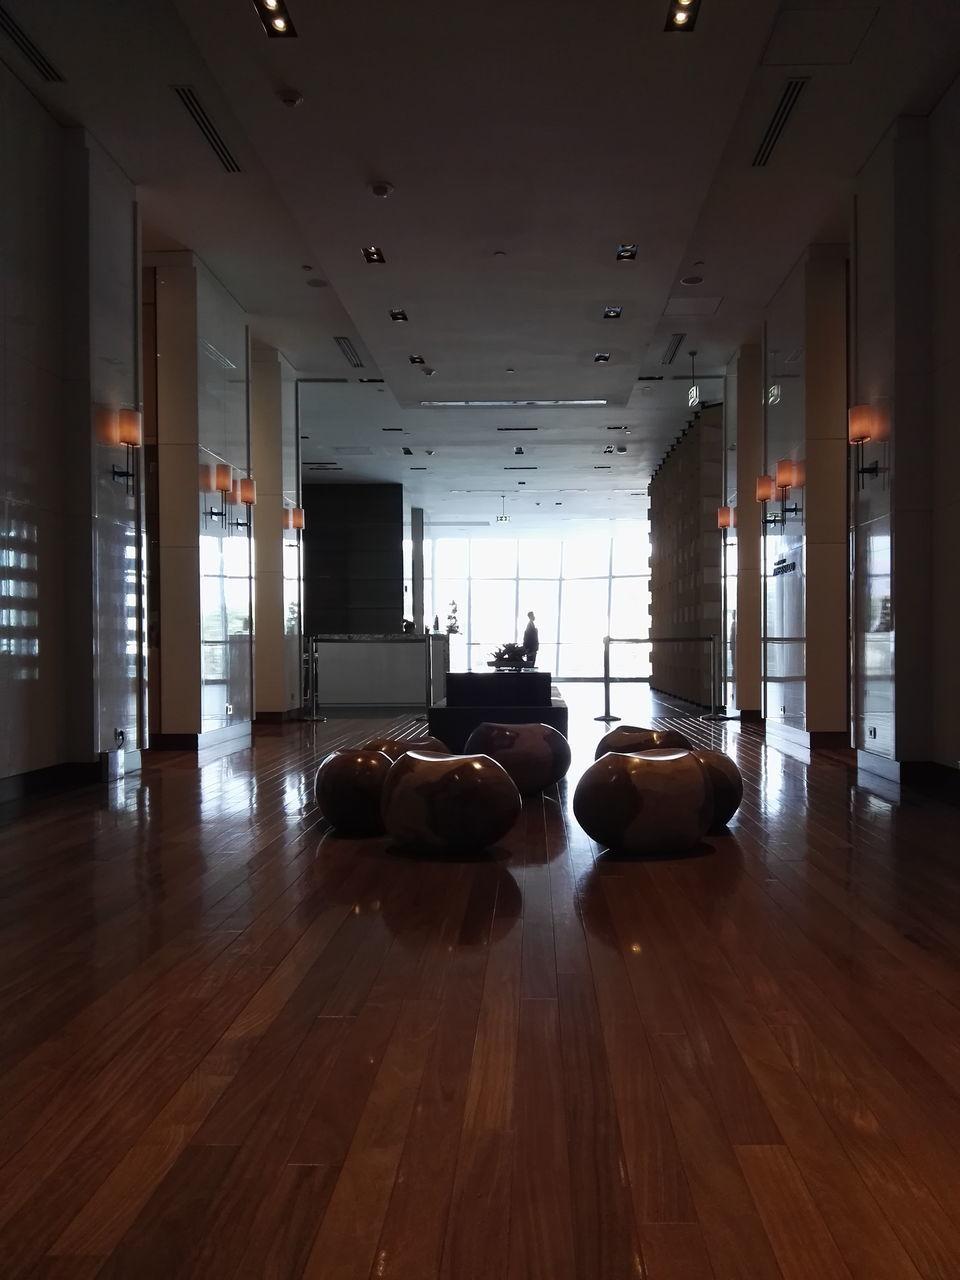 indoors, flooring, hardwood floor, window, no people, home interior, architecture, built structure, living room, day, modern